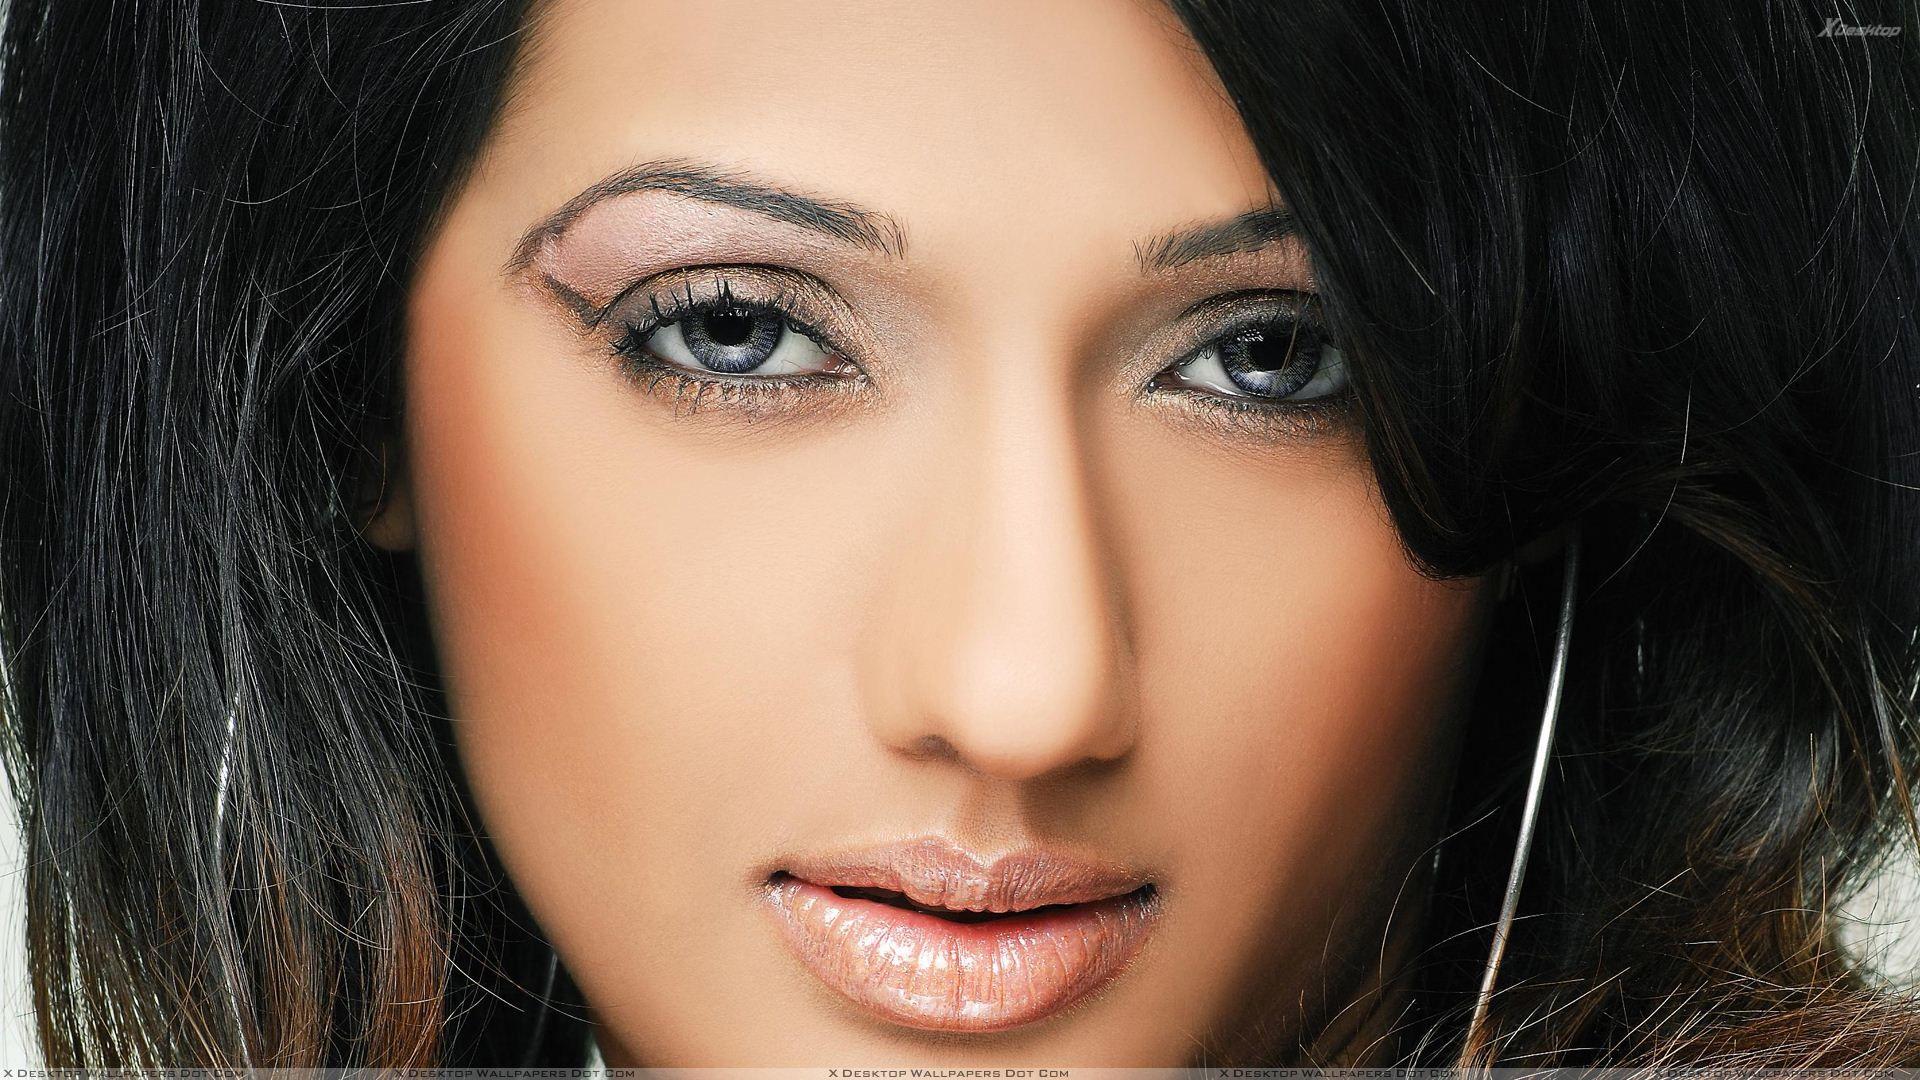 Brinda Parekh Wiki, Biography, Age, Movies, Videos, Photos